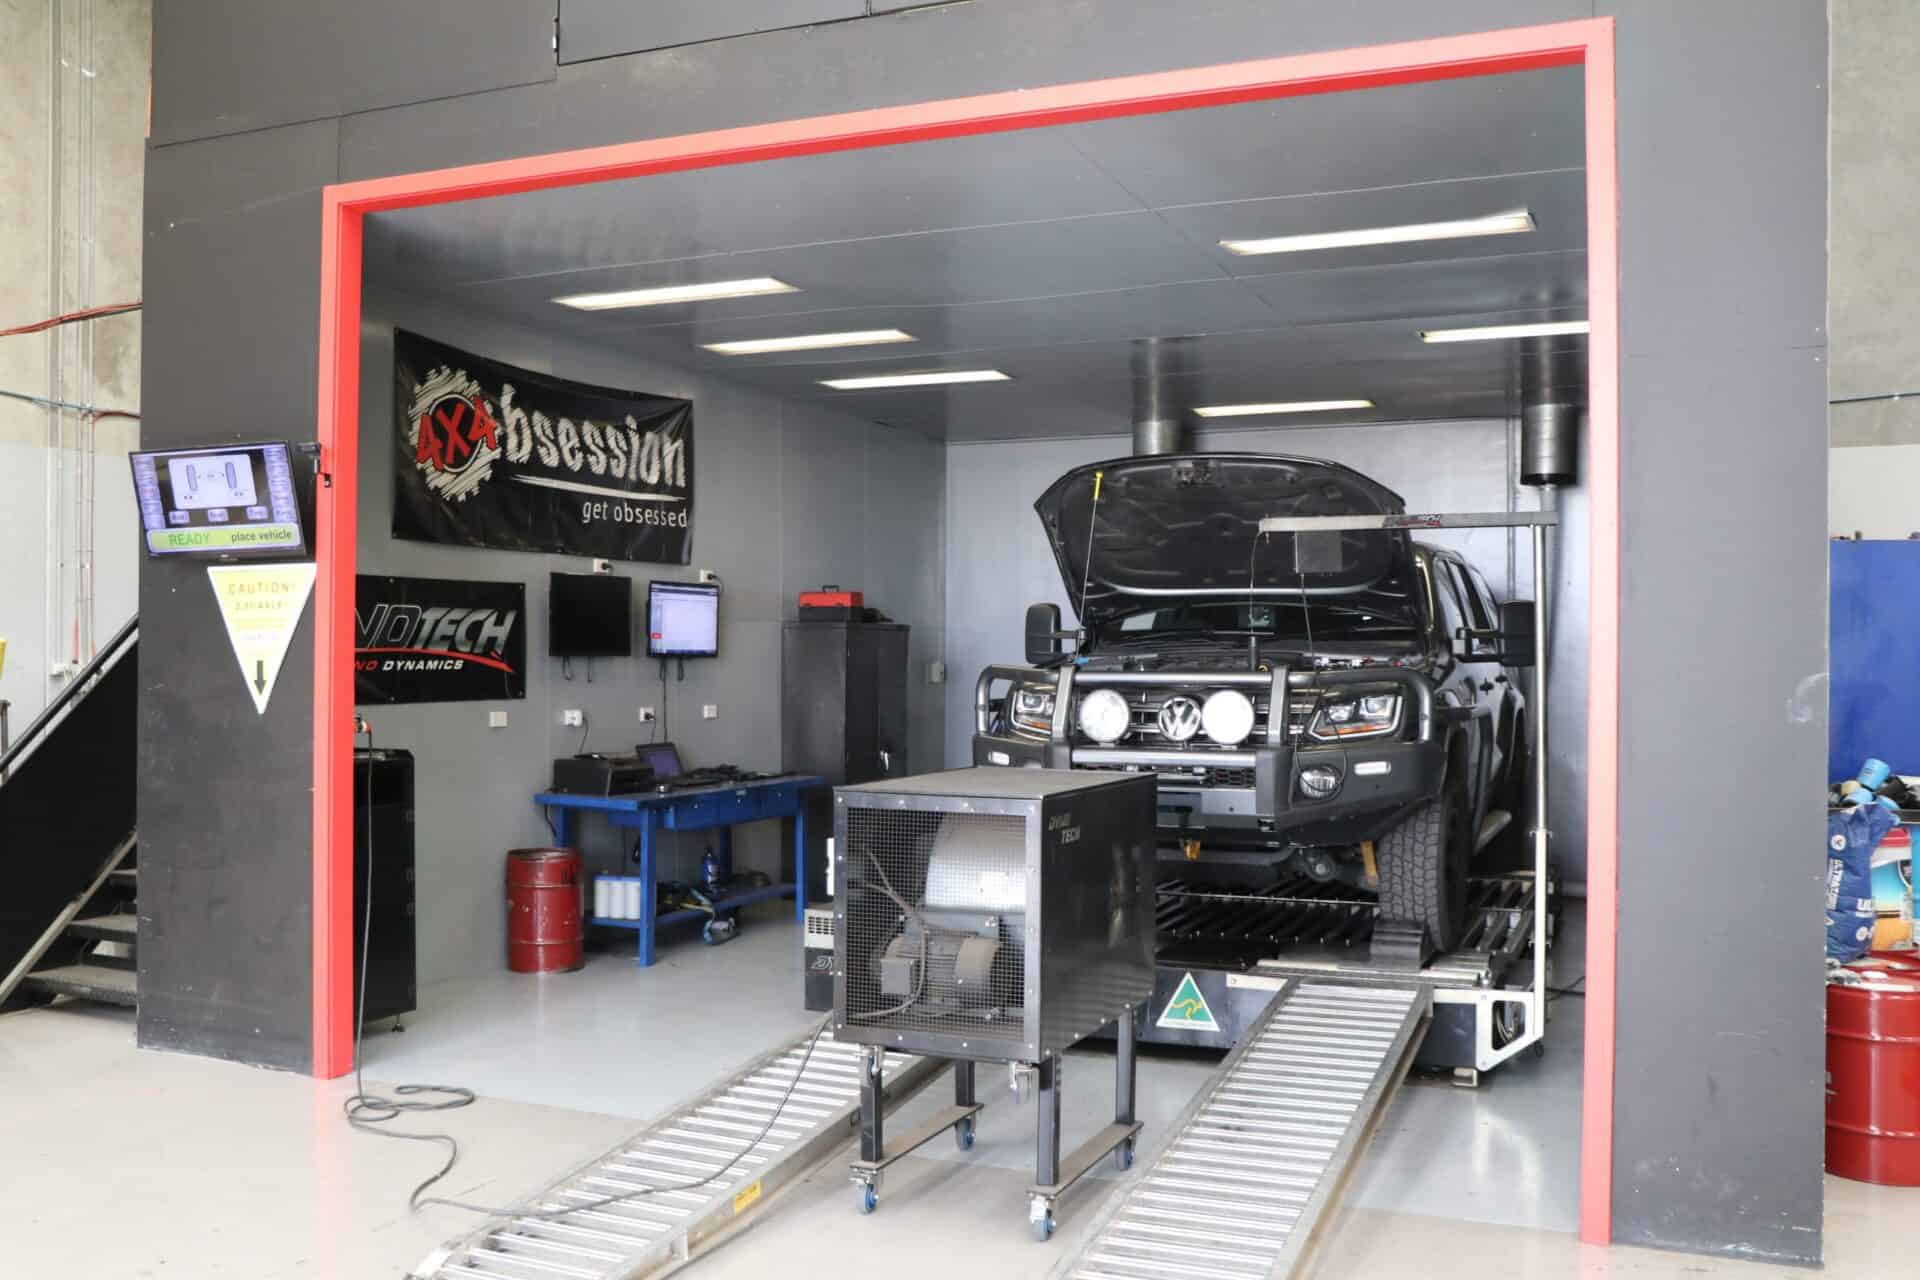 Diesel Tuning Mechanics perform 4WD Dynamometer Testing   4x4 Obsession Workshop, Melbourne, Victoria